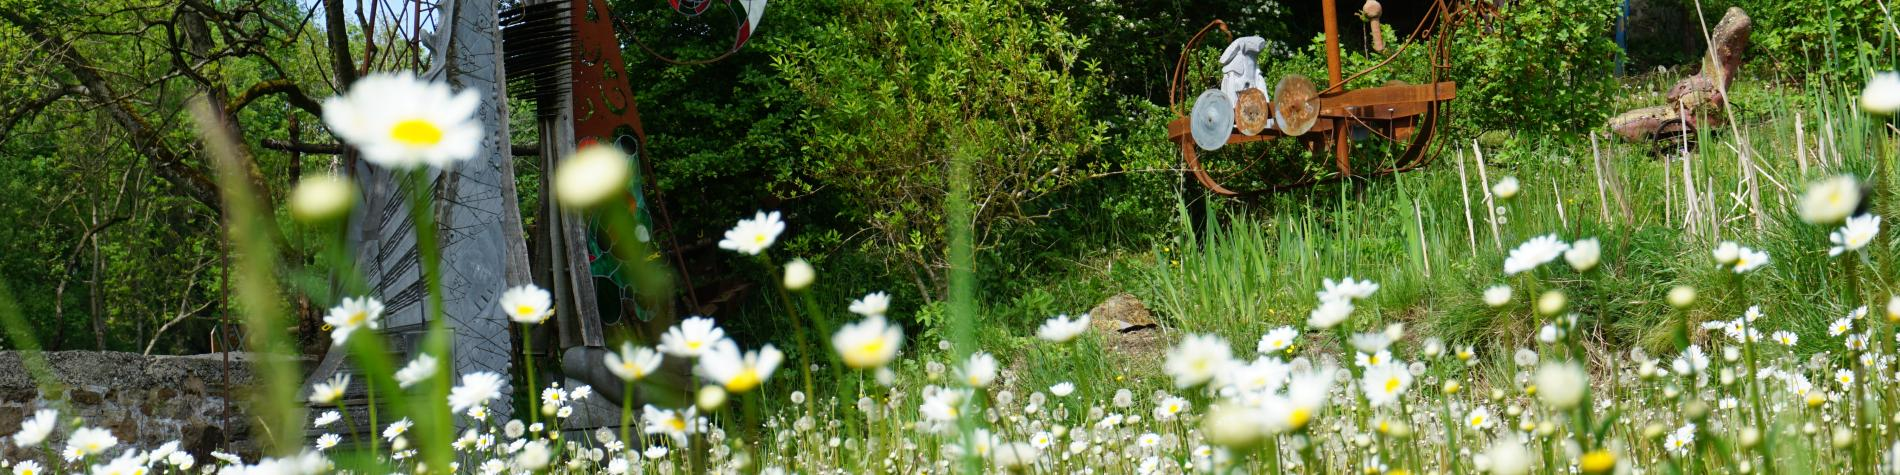 Jardin fleuri et boisé